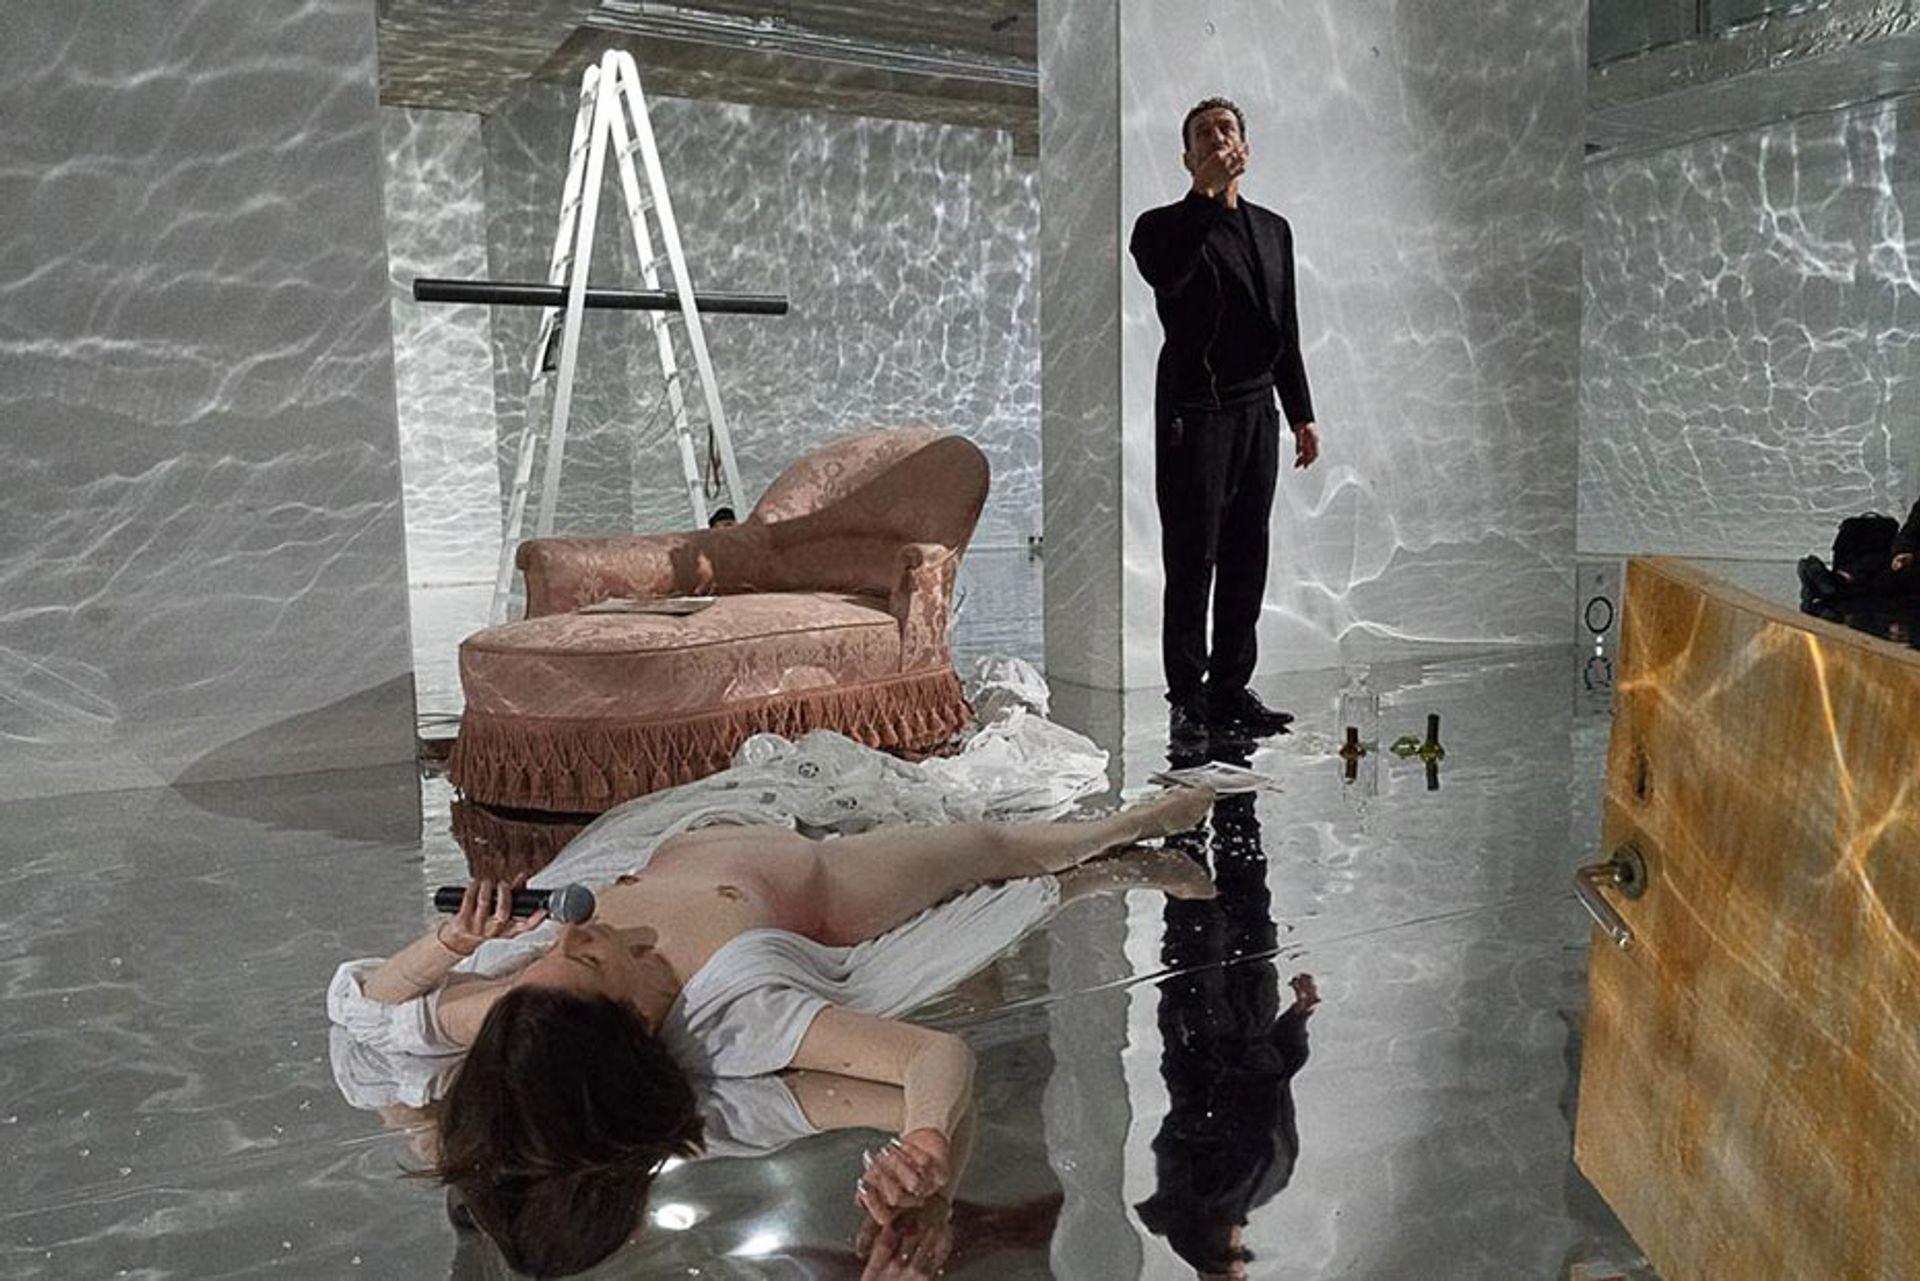 Sophie Jung performing The Bigger Sleep rehush (hush) (2019) Courtesy Block Universe, Photo: Manuela Barczewski.